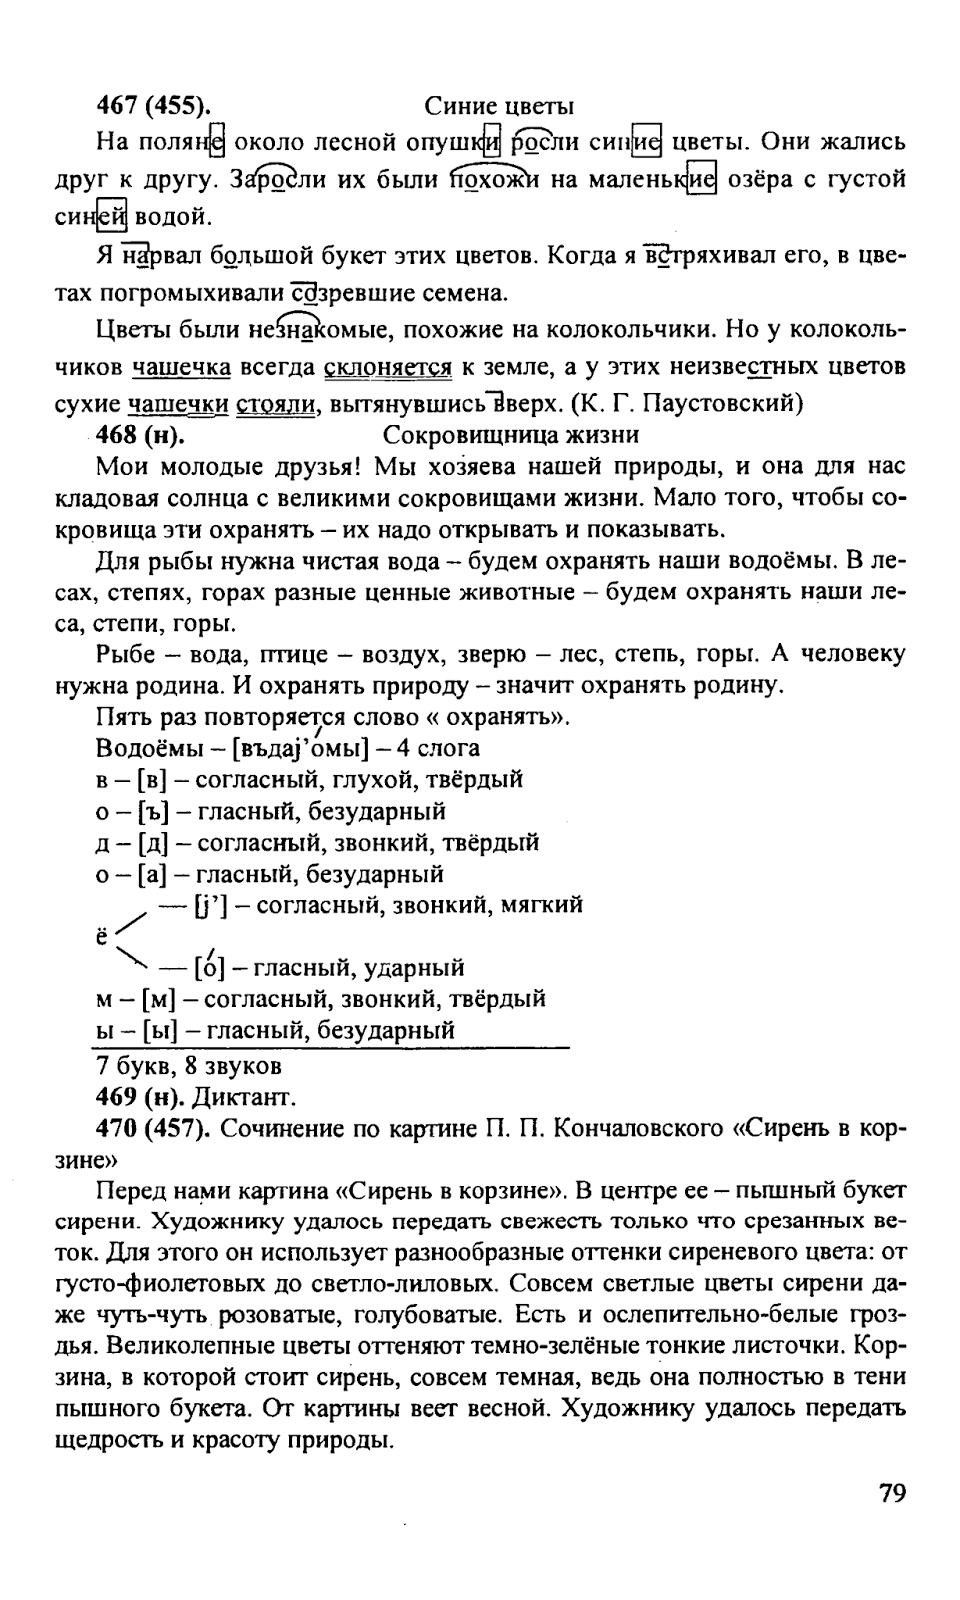 Гдз по литературе 8 класс барова чиндилова